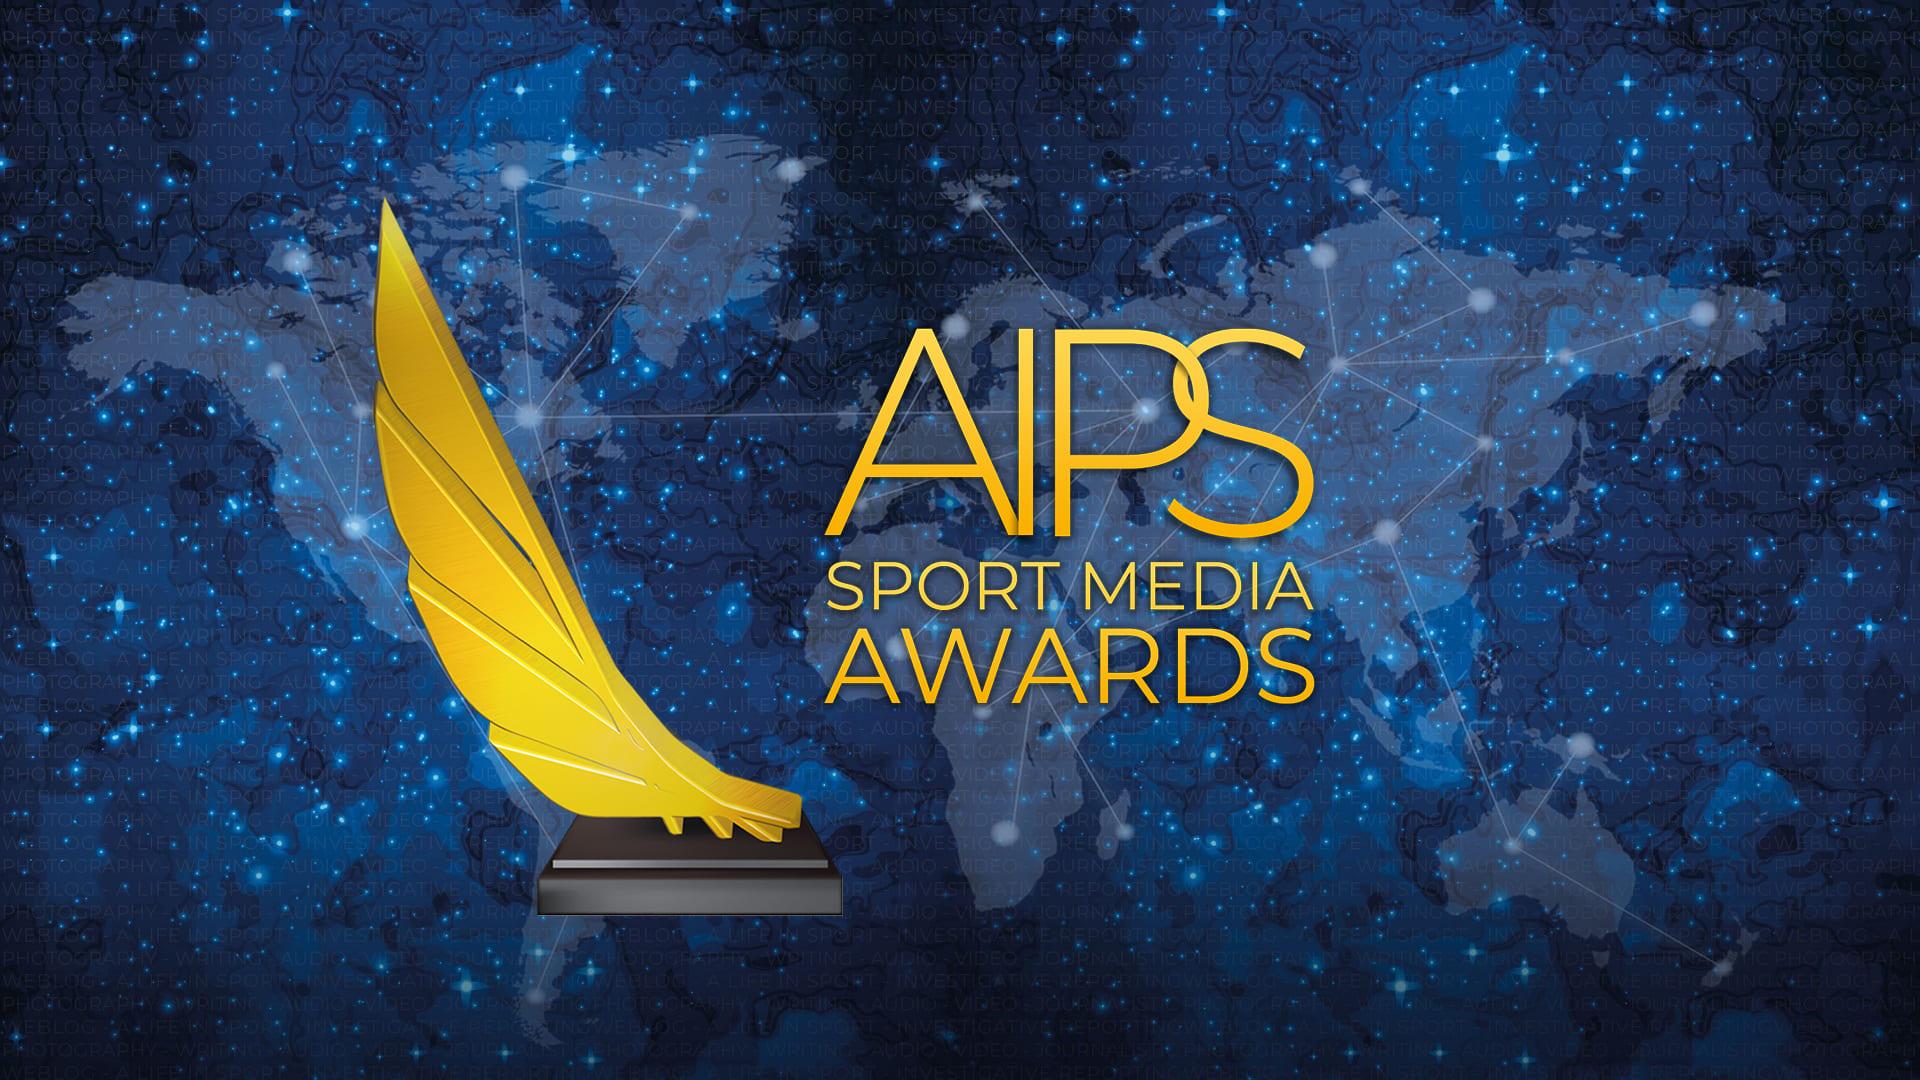 AIPS Sport Media Awards 2020 are parte de o ceremonie virtuală